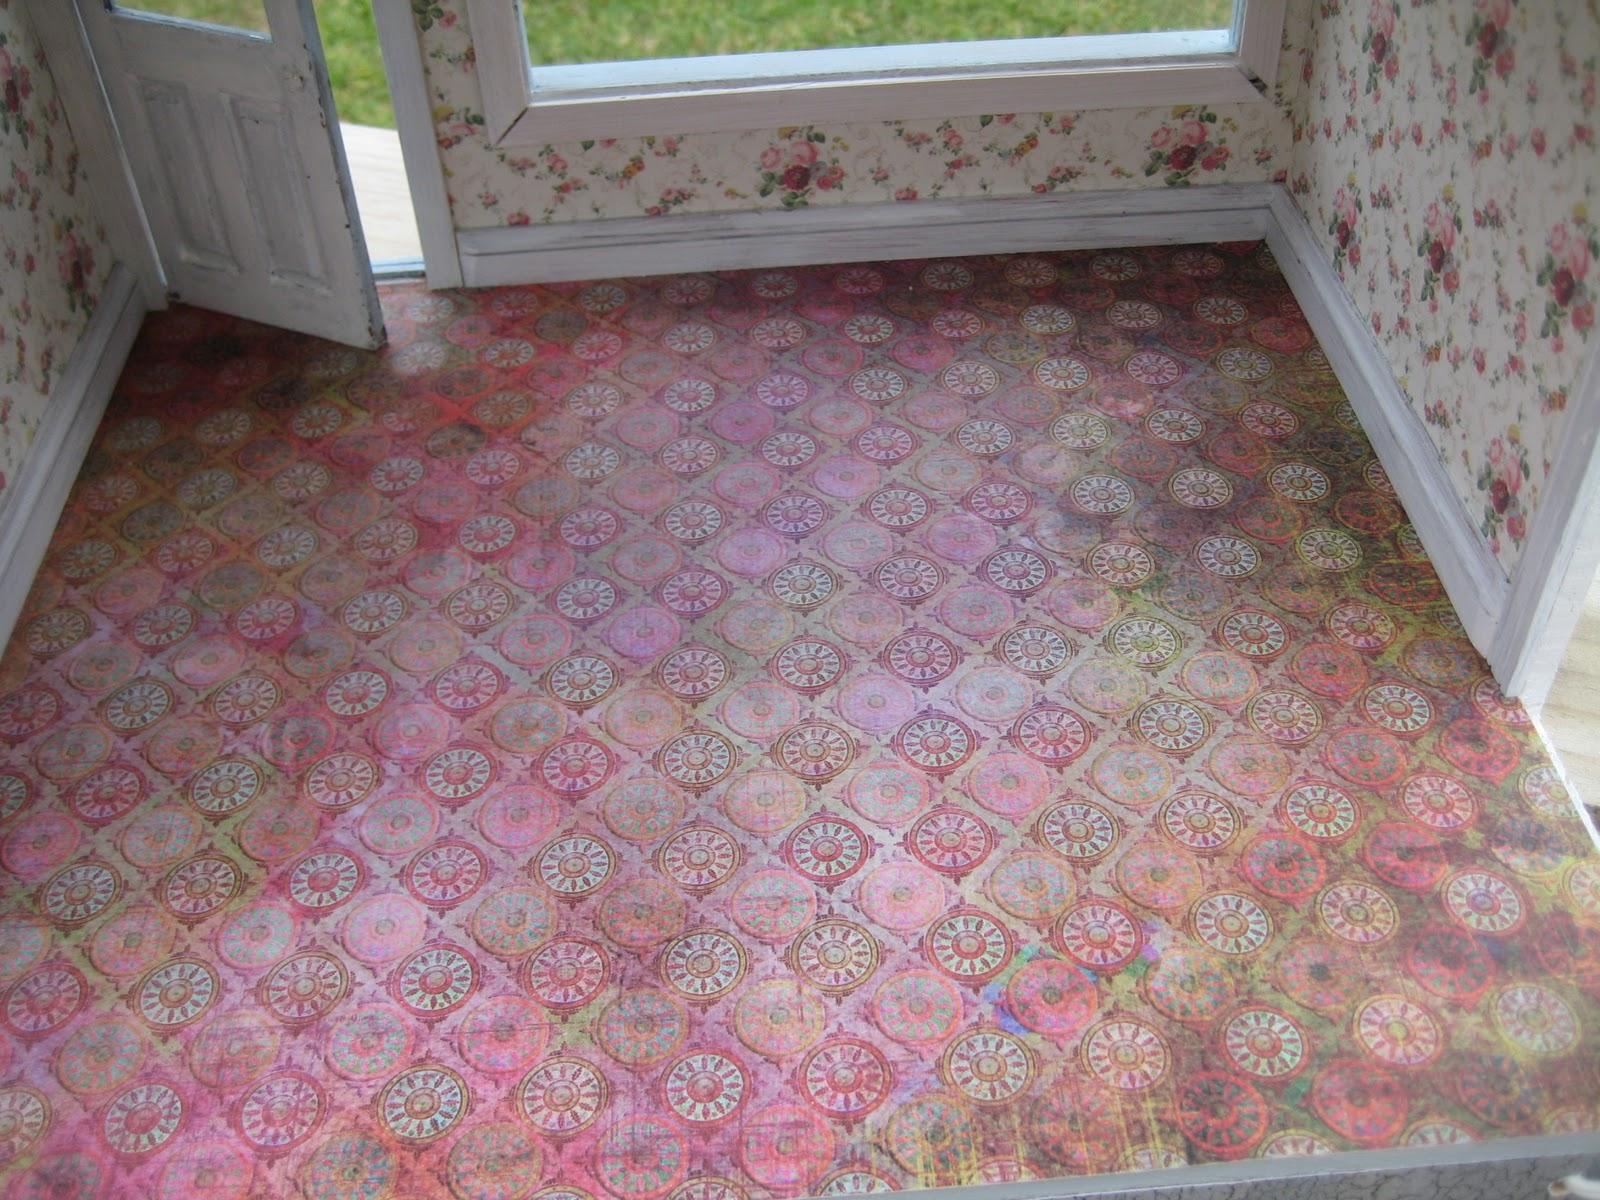 Scrapbook paper dollhouse wallpaper - Wednesday March 9 2011